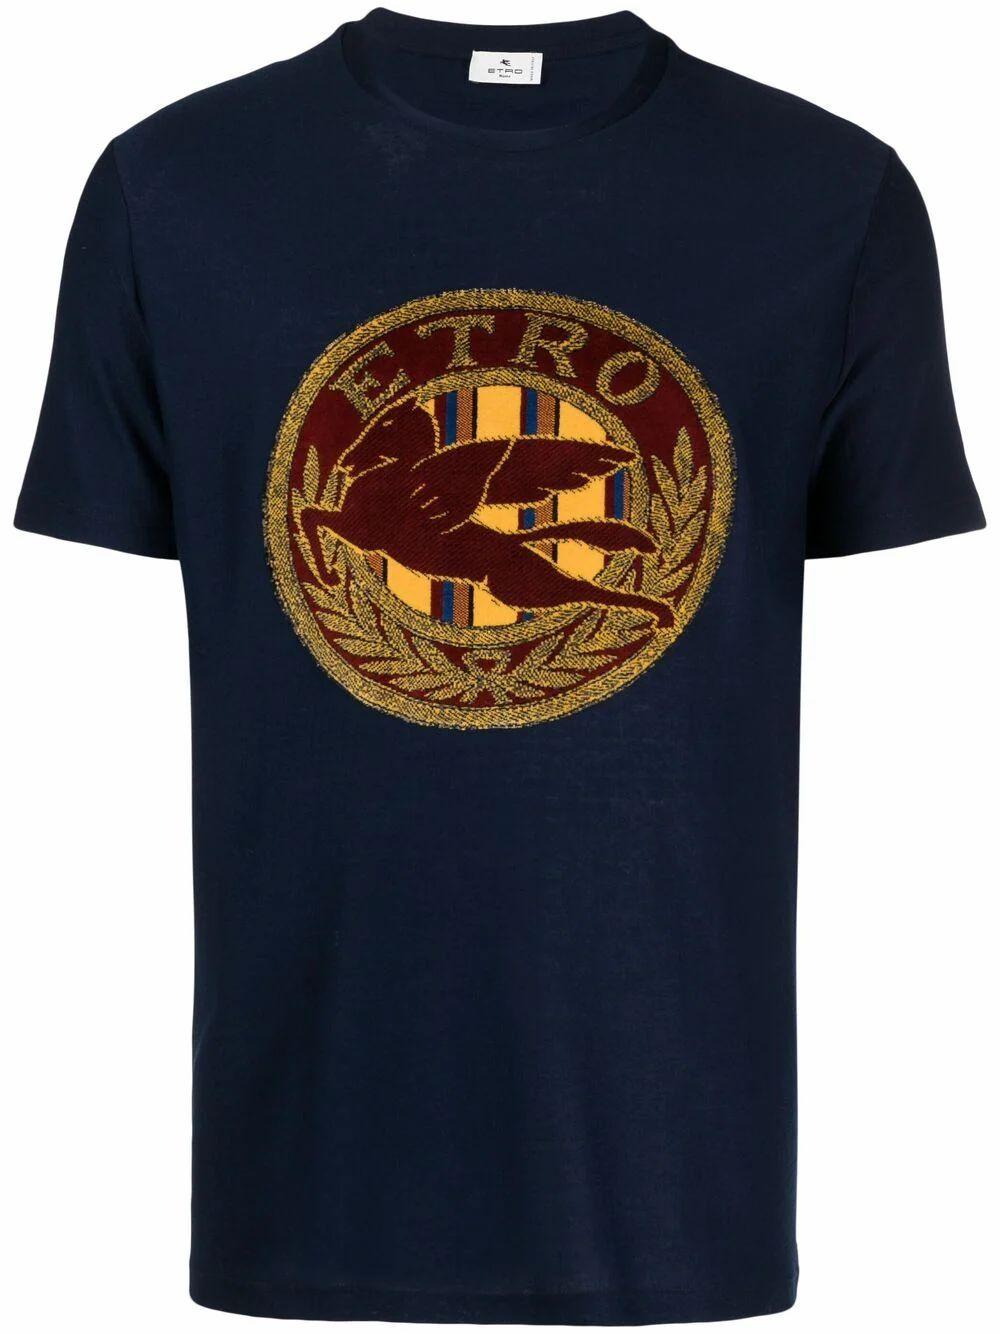 Etro Clothing ETRO MEN'S BLUE COTTON T-SHIRT